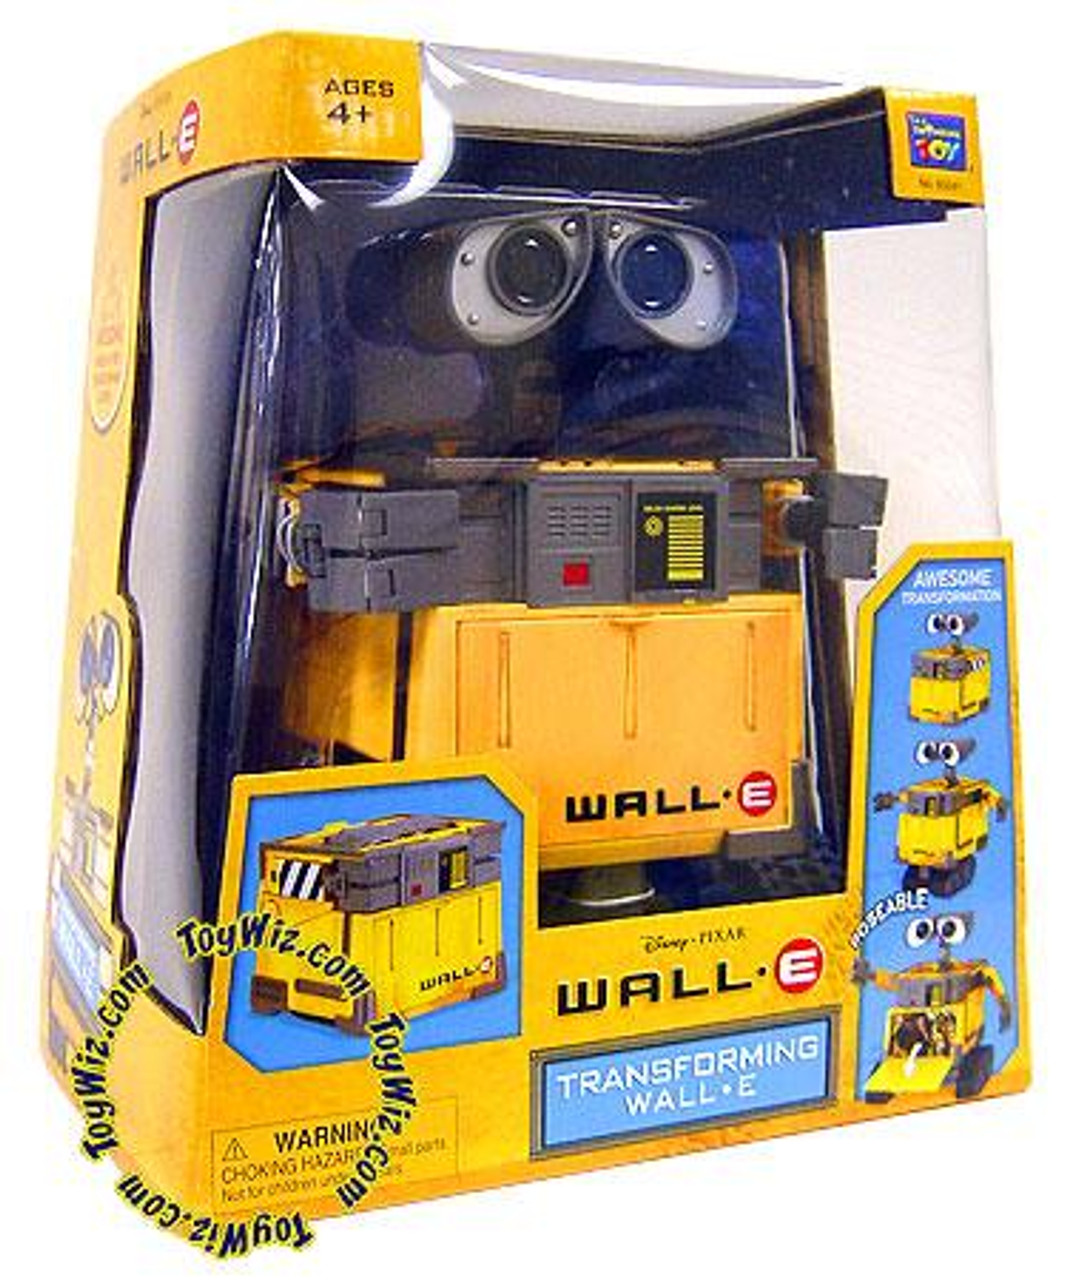 Disney / Pixar Transforming Wall-E Exclusive Action Figure